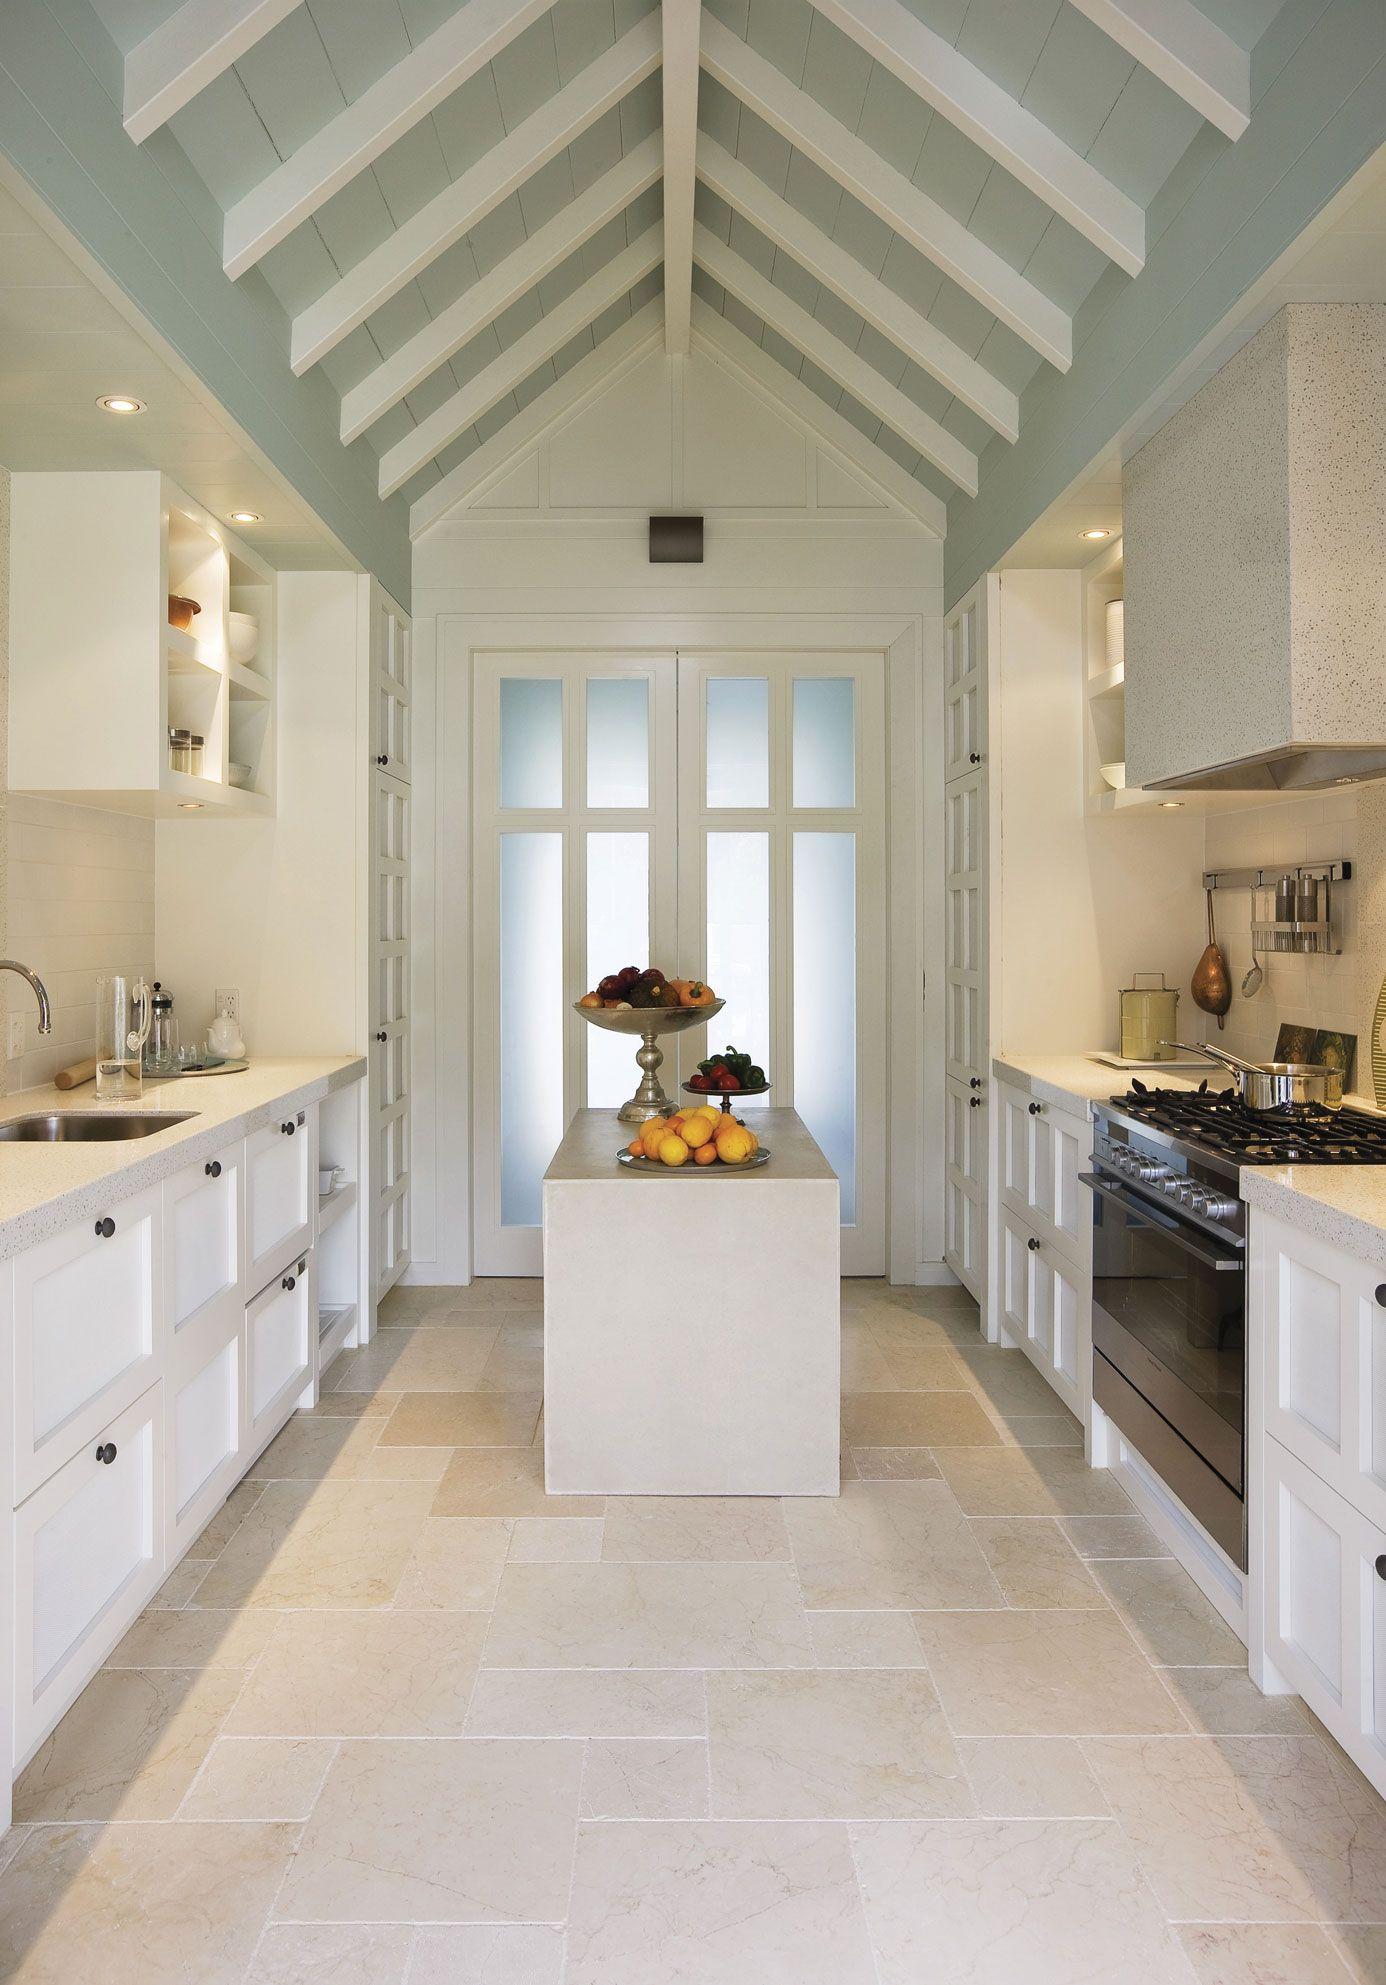 Alan Pye Cottage Kitchen  Lodge Style  Pinterest  Cottages The Awesome Nz Kitchen Design 2018